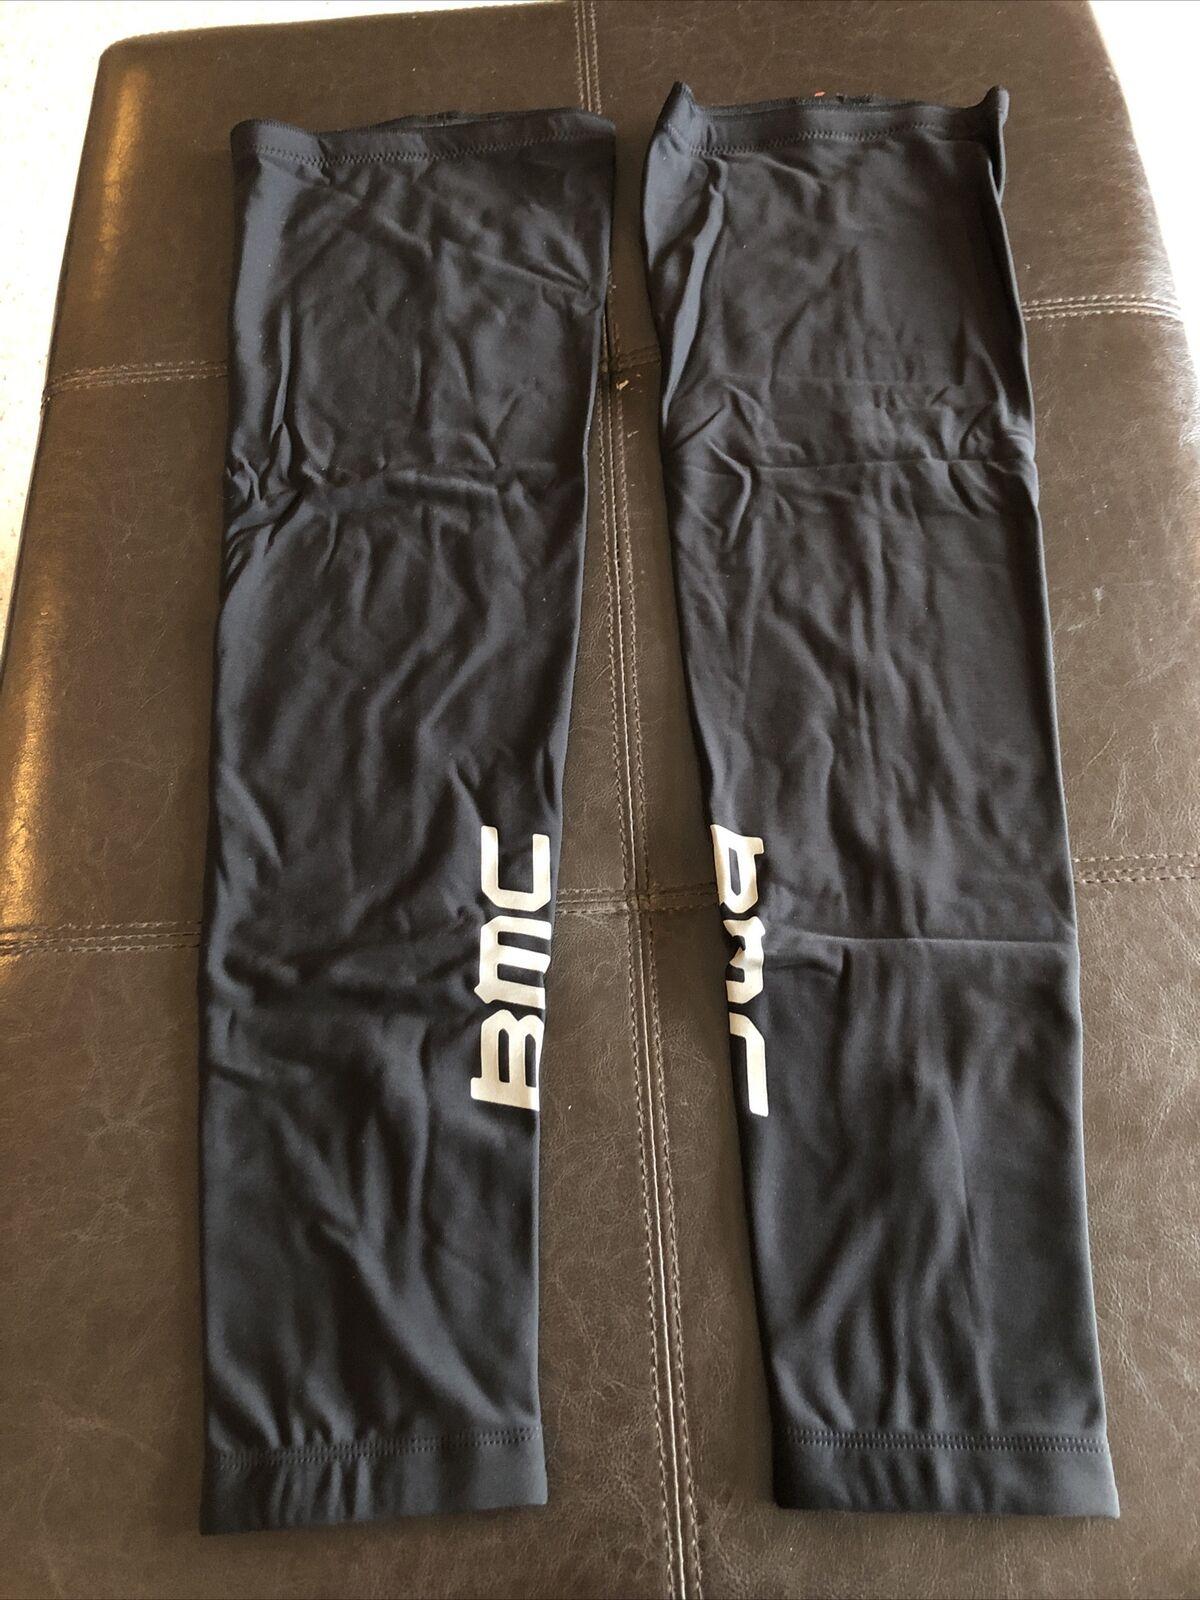 Extra Large BMC Team Leg Warmers